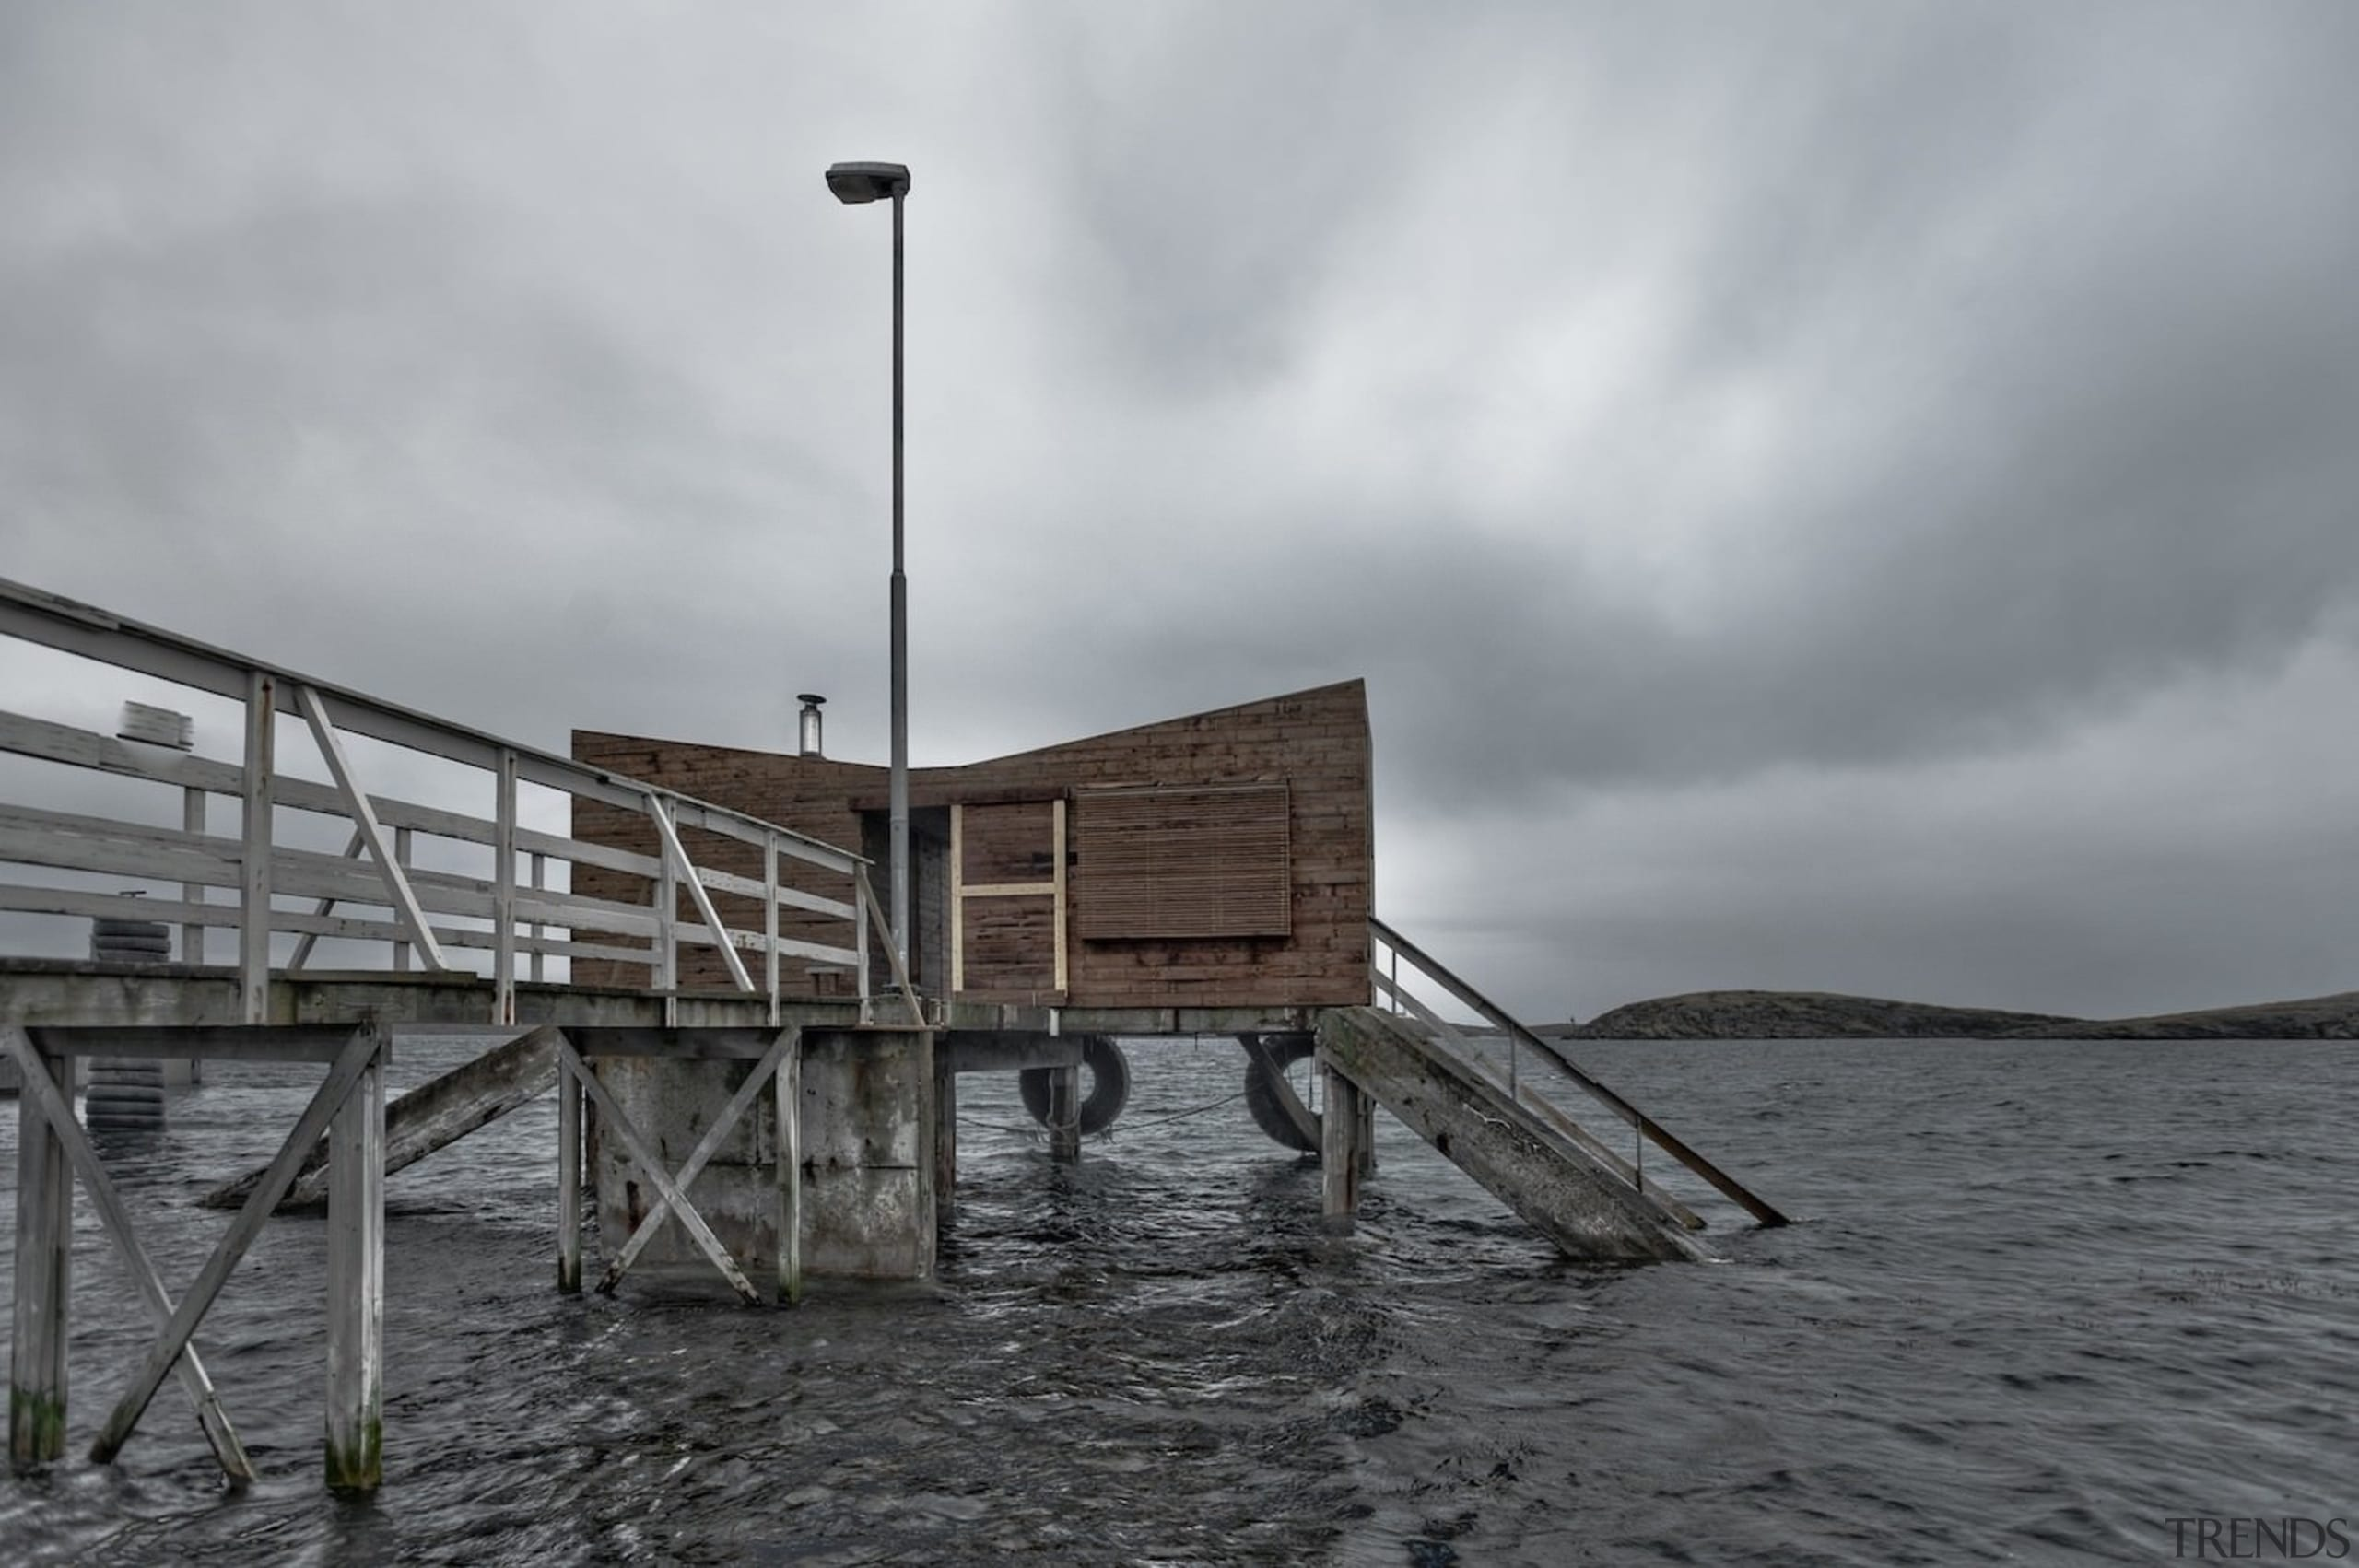 Architect: TYIN tegnestue ArchitectsPhotographer: Pasi Aalto / cloud, dock, pier, sea, sky, water, wood, gray